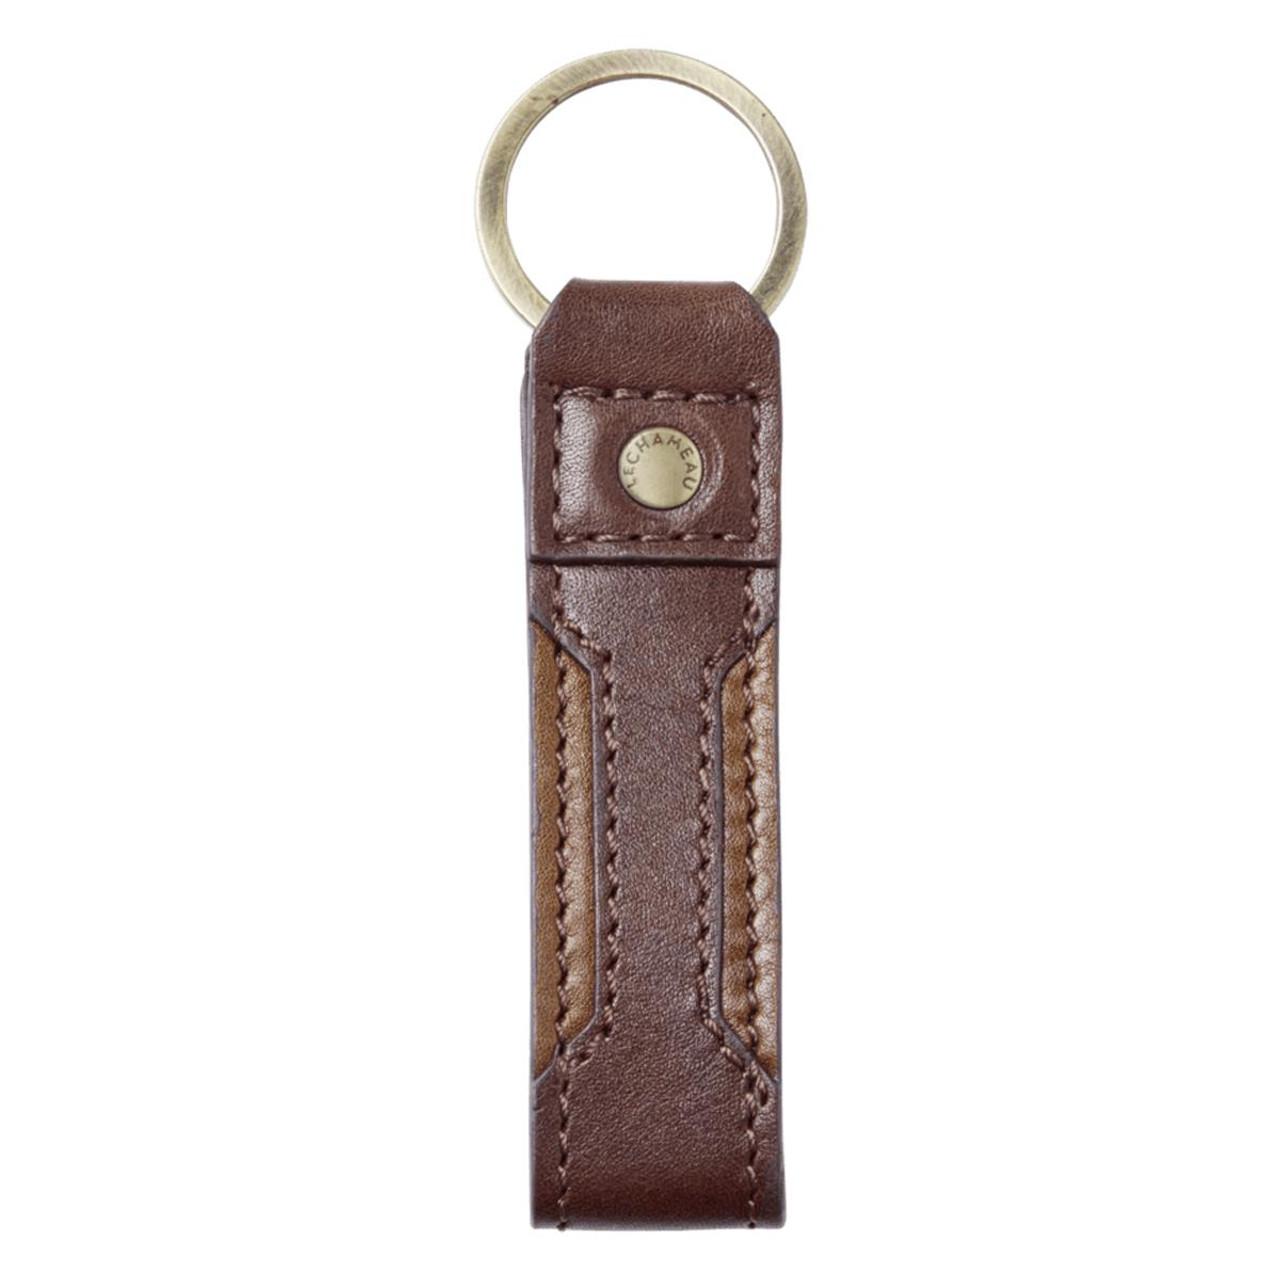 Marron Fonce Le Chameau Leather Jameson Key Ring